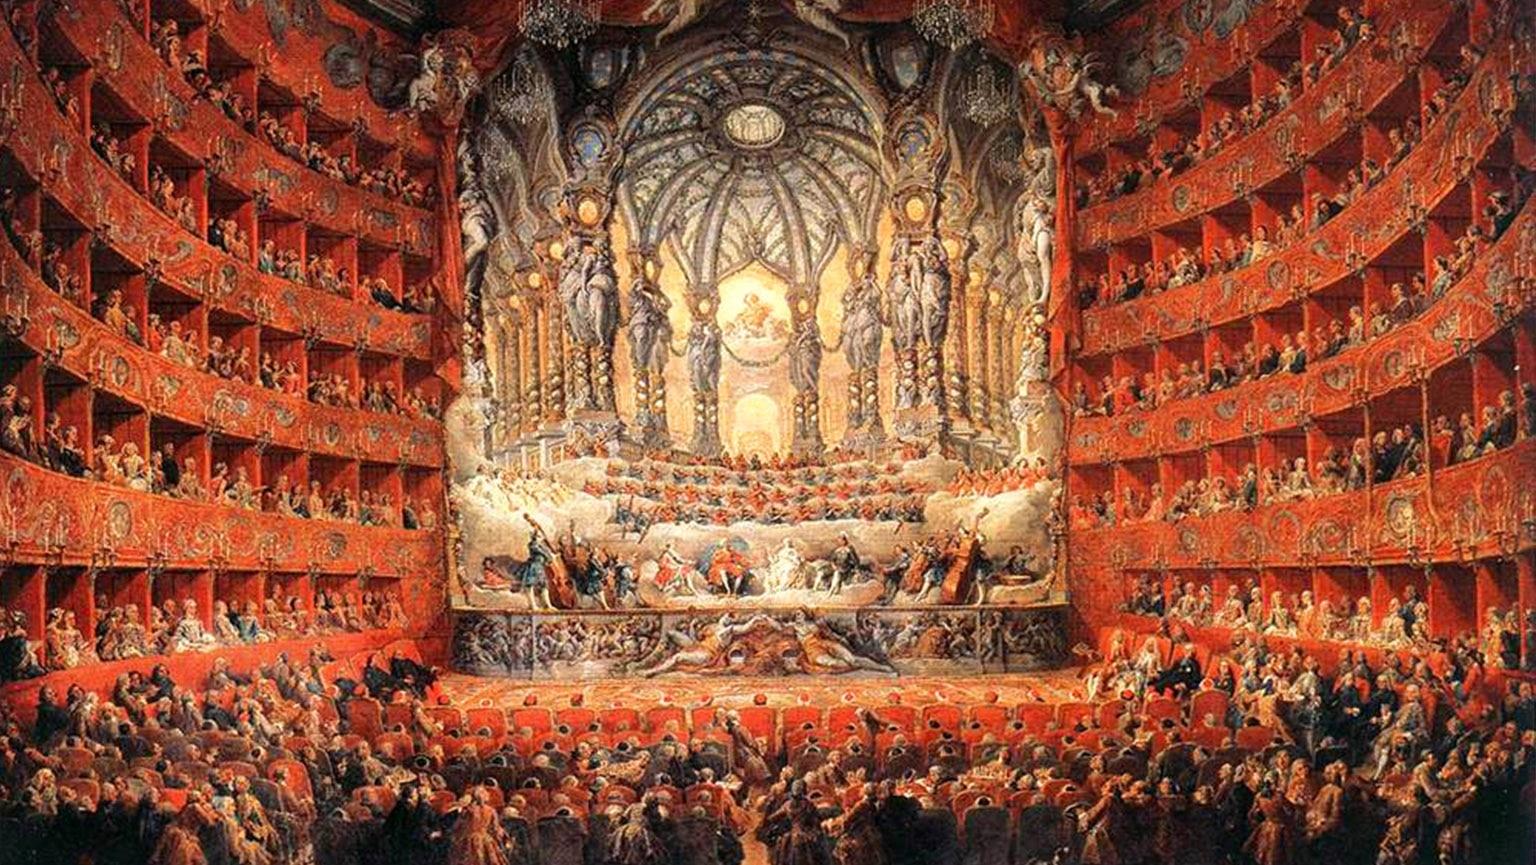 The Growth of Opera, the Development of Italian Opera Seria, and Mozart's Idomeneo, I